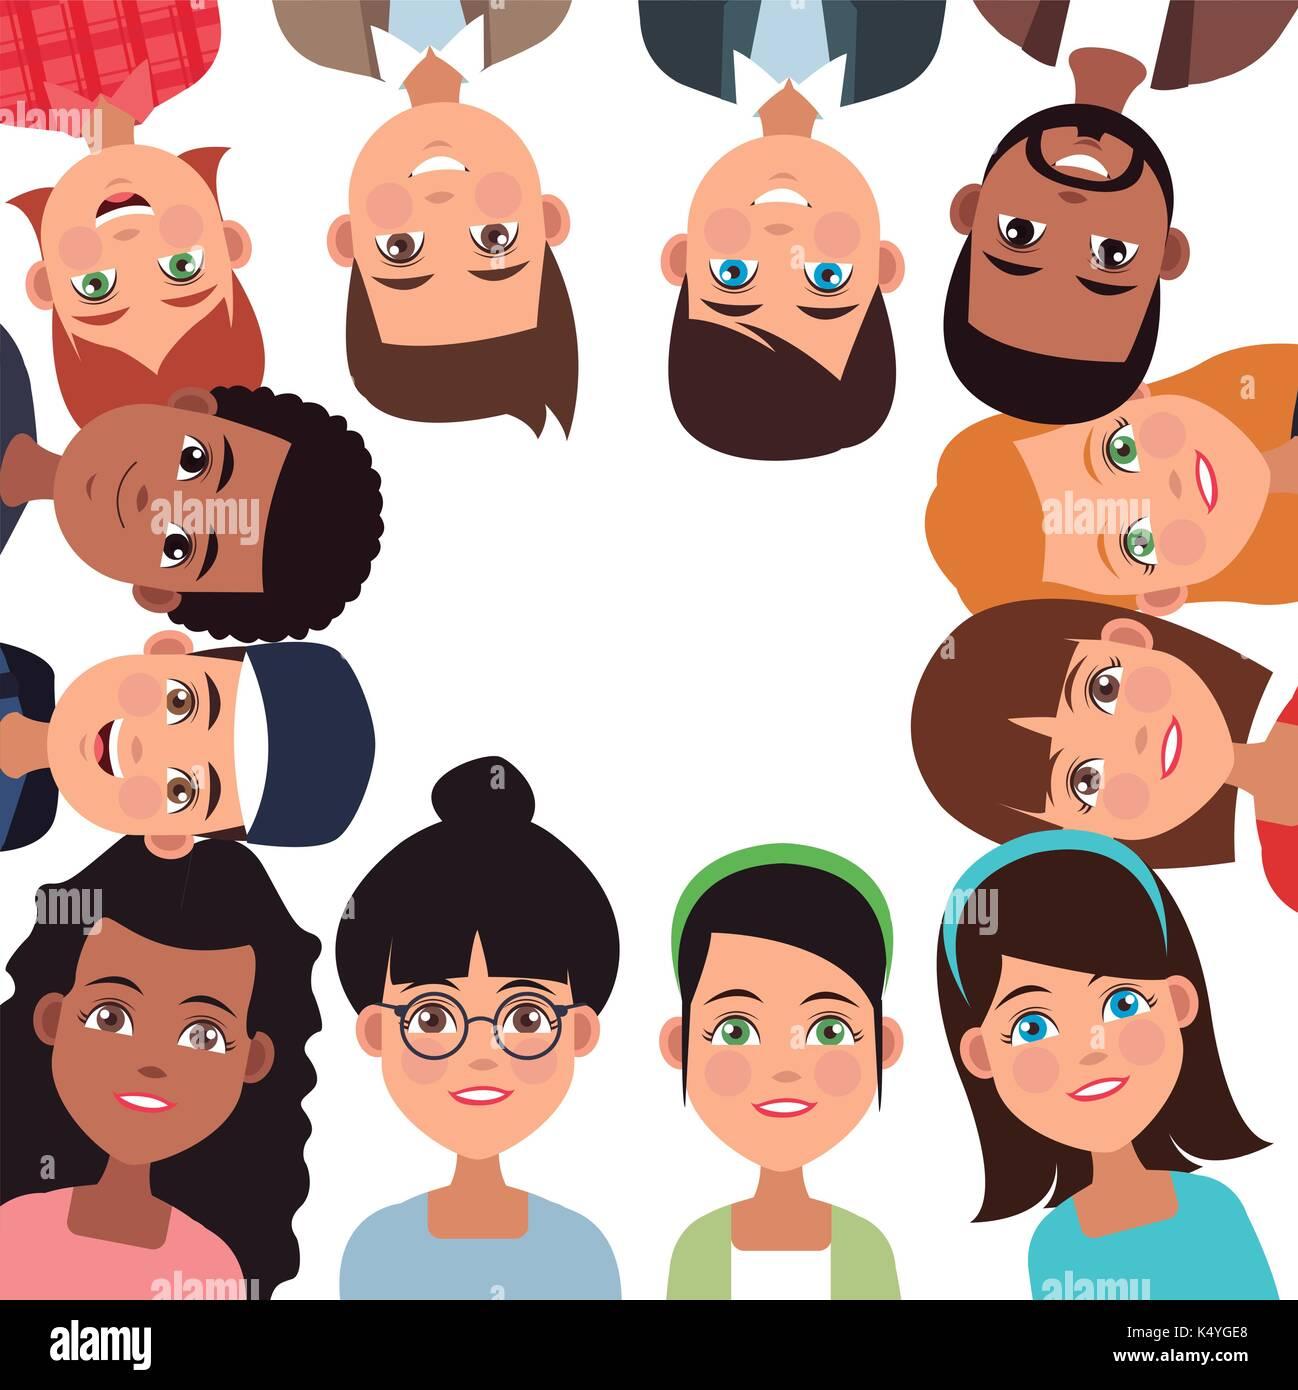 Design dessin animé d'amitié Photo Stock